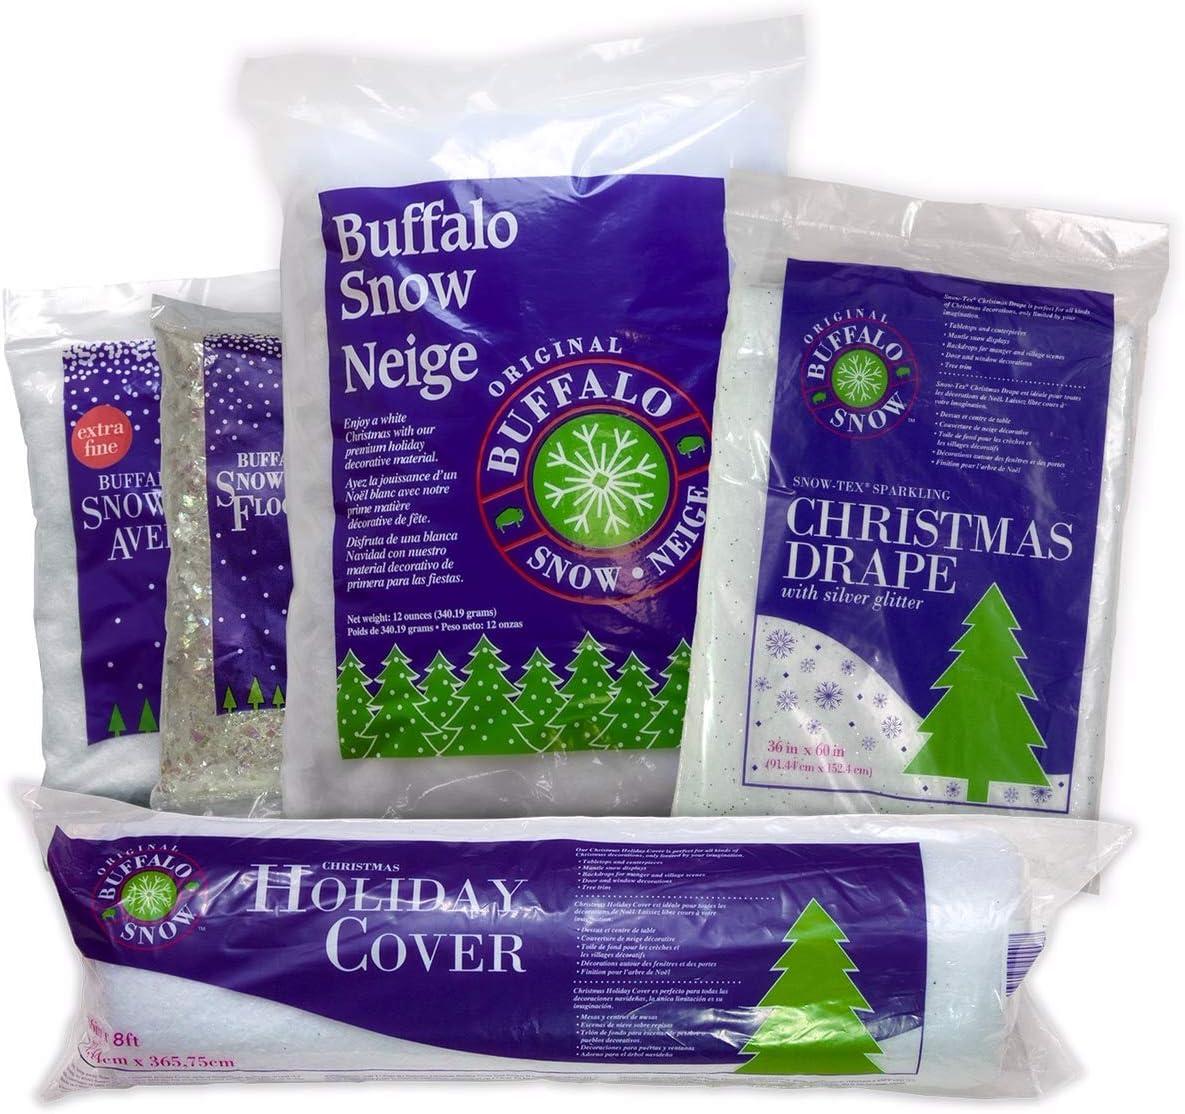 Buffalo Snow Village Snow Kit Including Holiday Cover, Snow-tex Sparkling Christmas Drape, Extra Fine Snow Flurries, Snowflakes